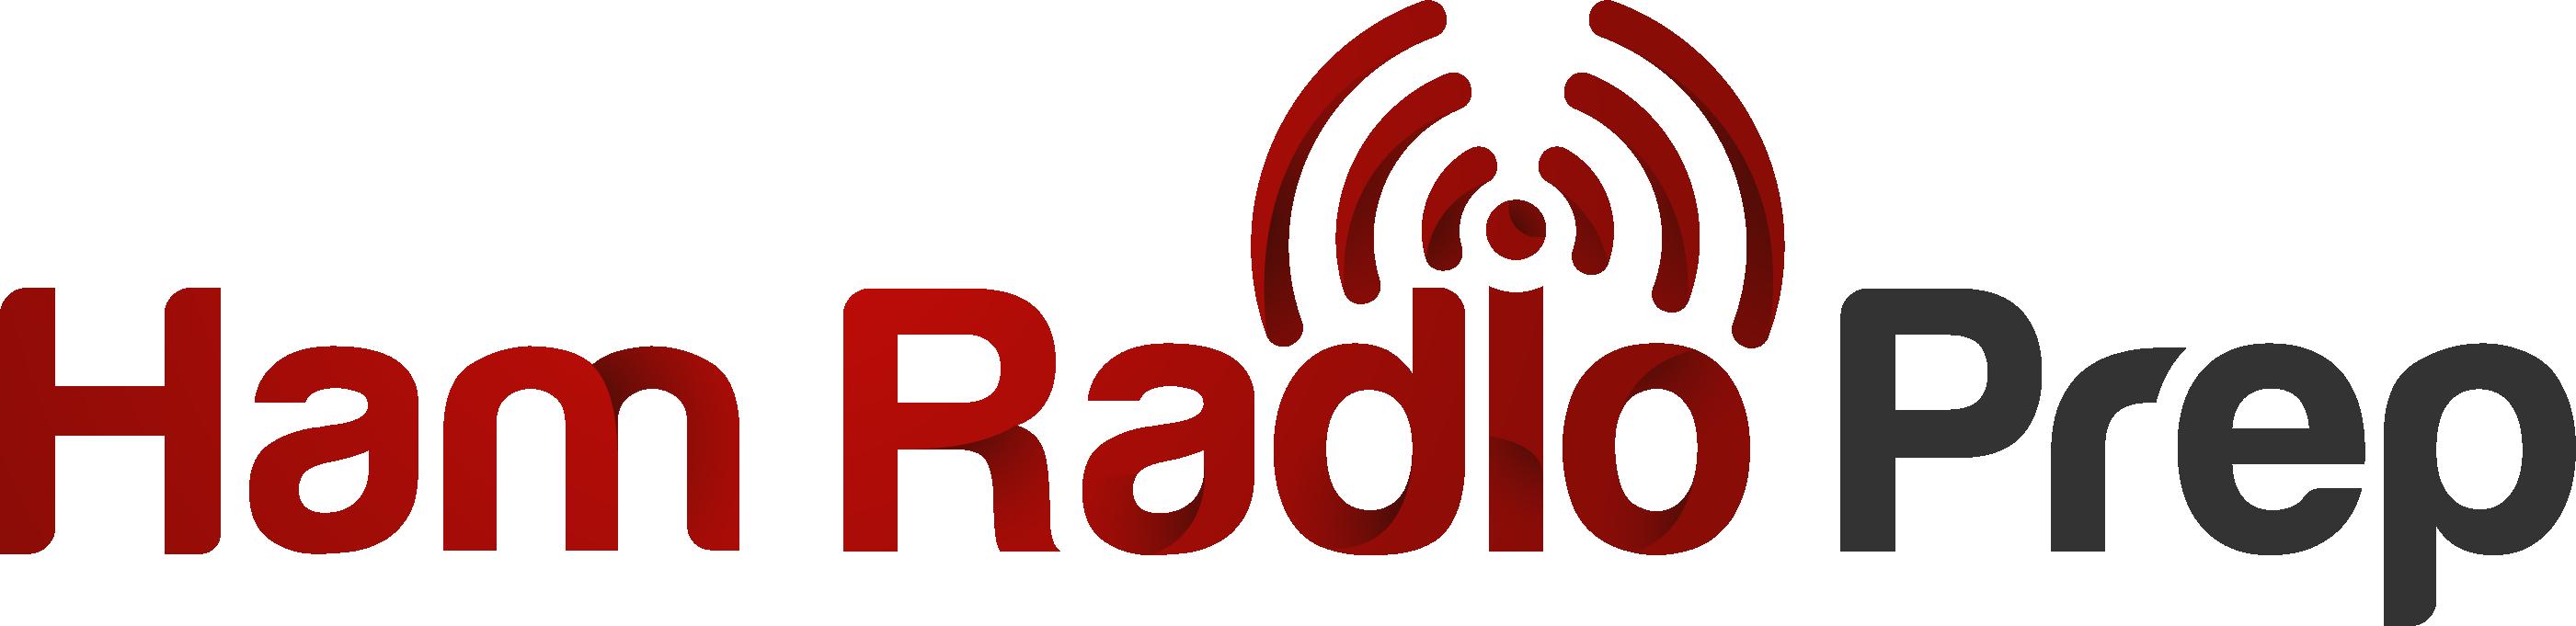 HamRadioPrep.com - Quick & Easy Ham Radio Online License Class